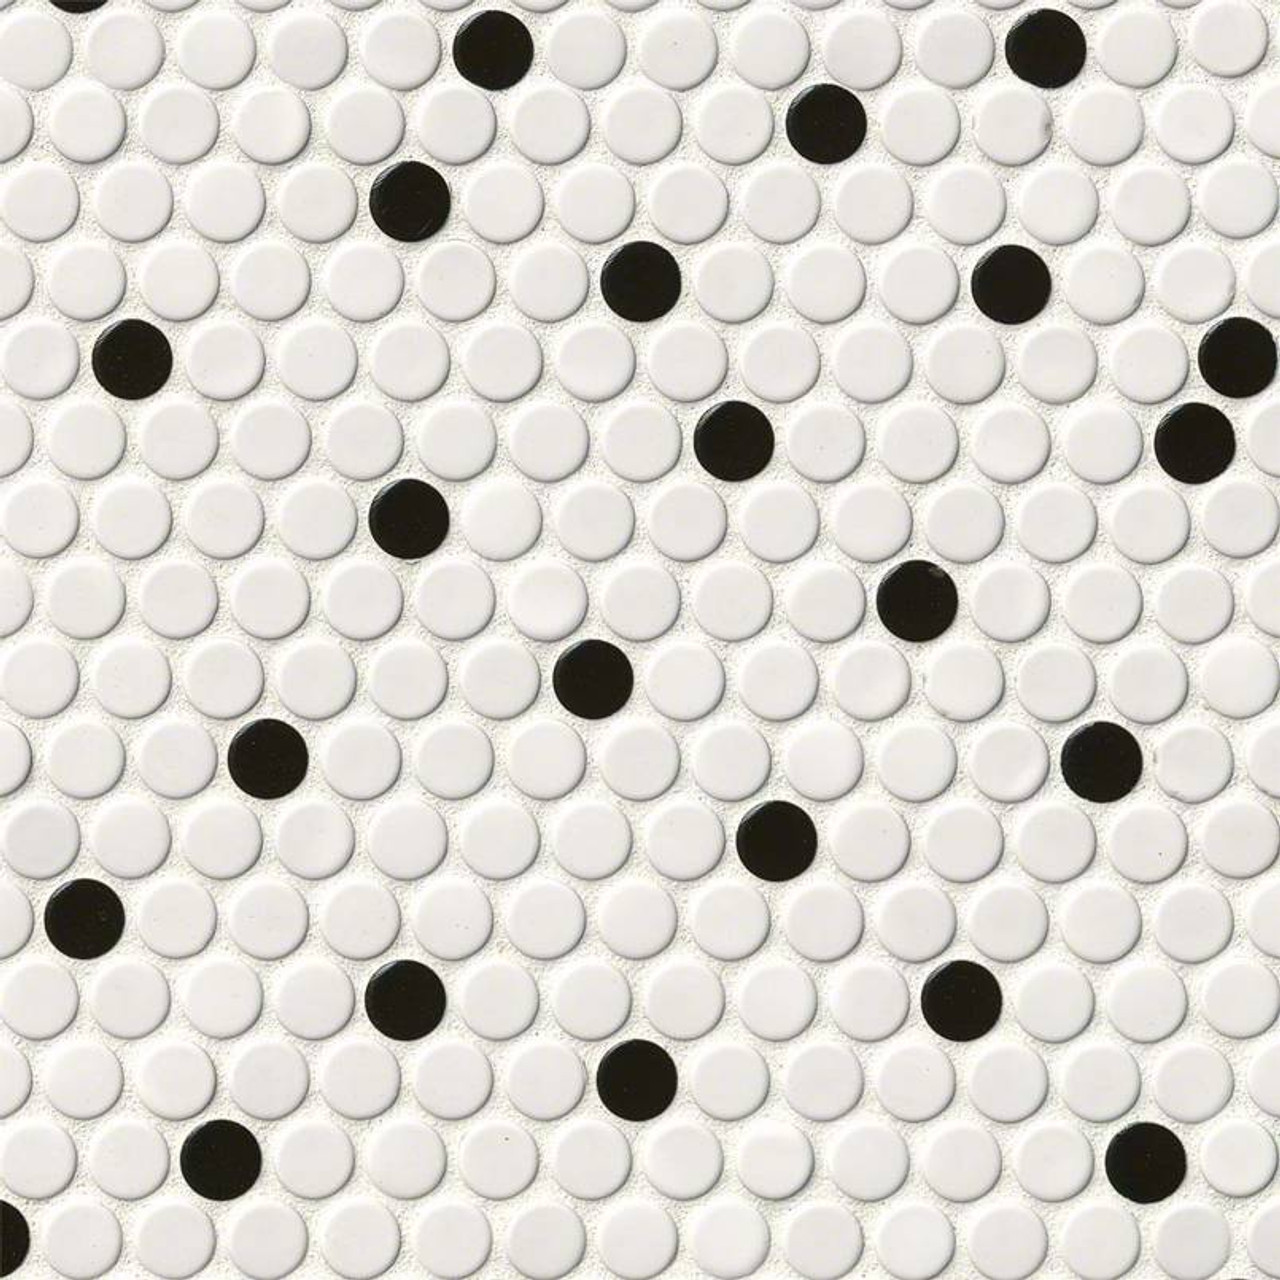 domino white black glossy penny round